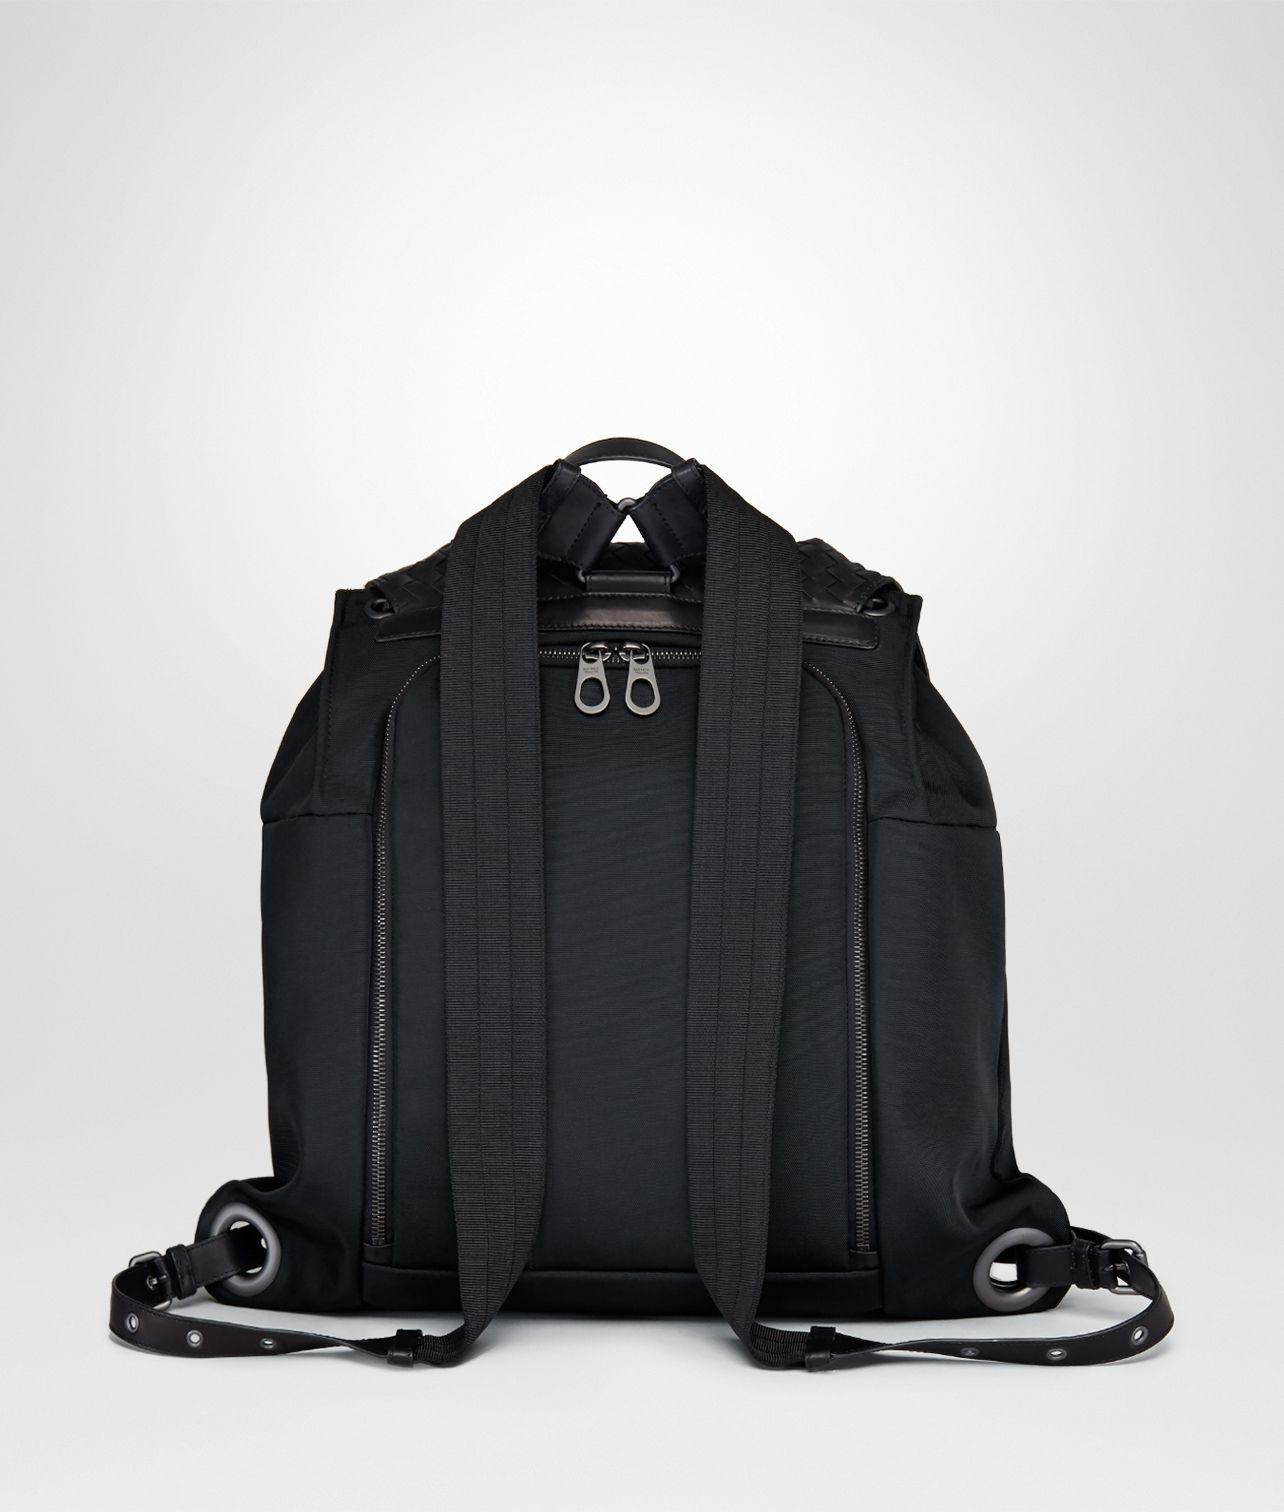 f856c44c34d5 Shop Bottega Veneta® Men s BACKPACK IN NERO TECHNICAL CANVAS AND  INTRECCIATO CALF. Discover more